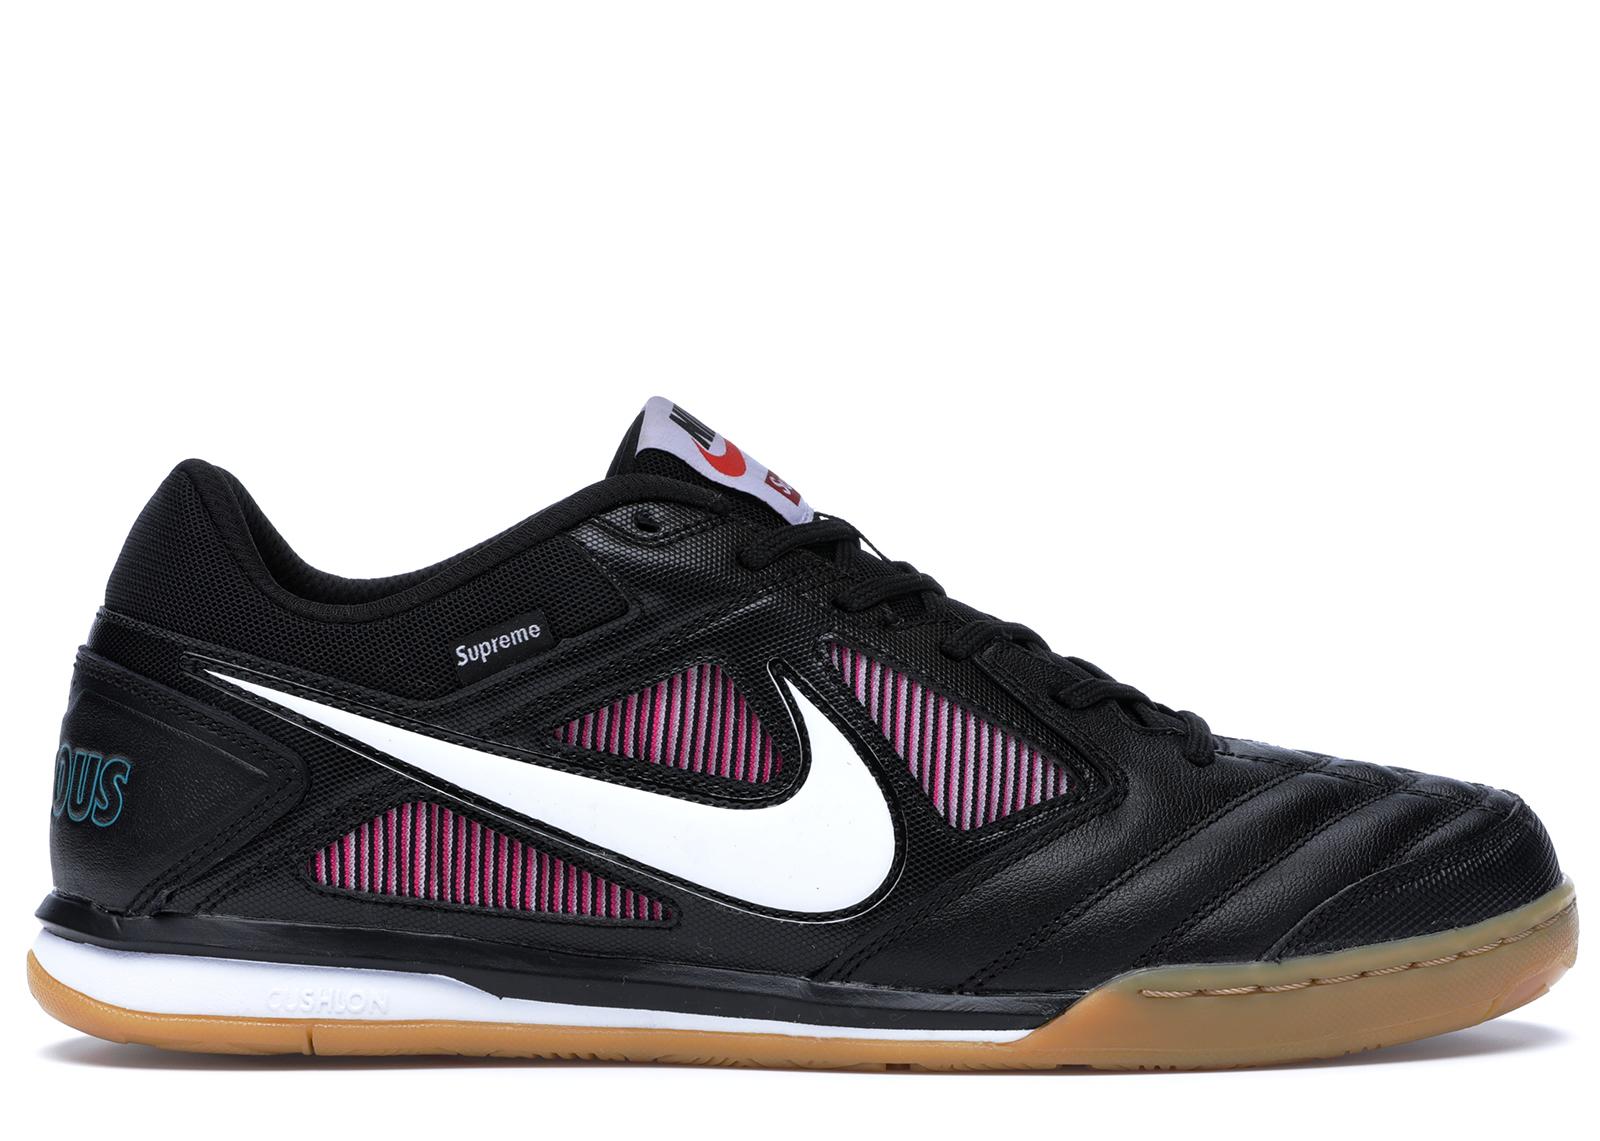 Nike SB Gato Supreme Black - AR9821-001